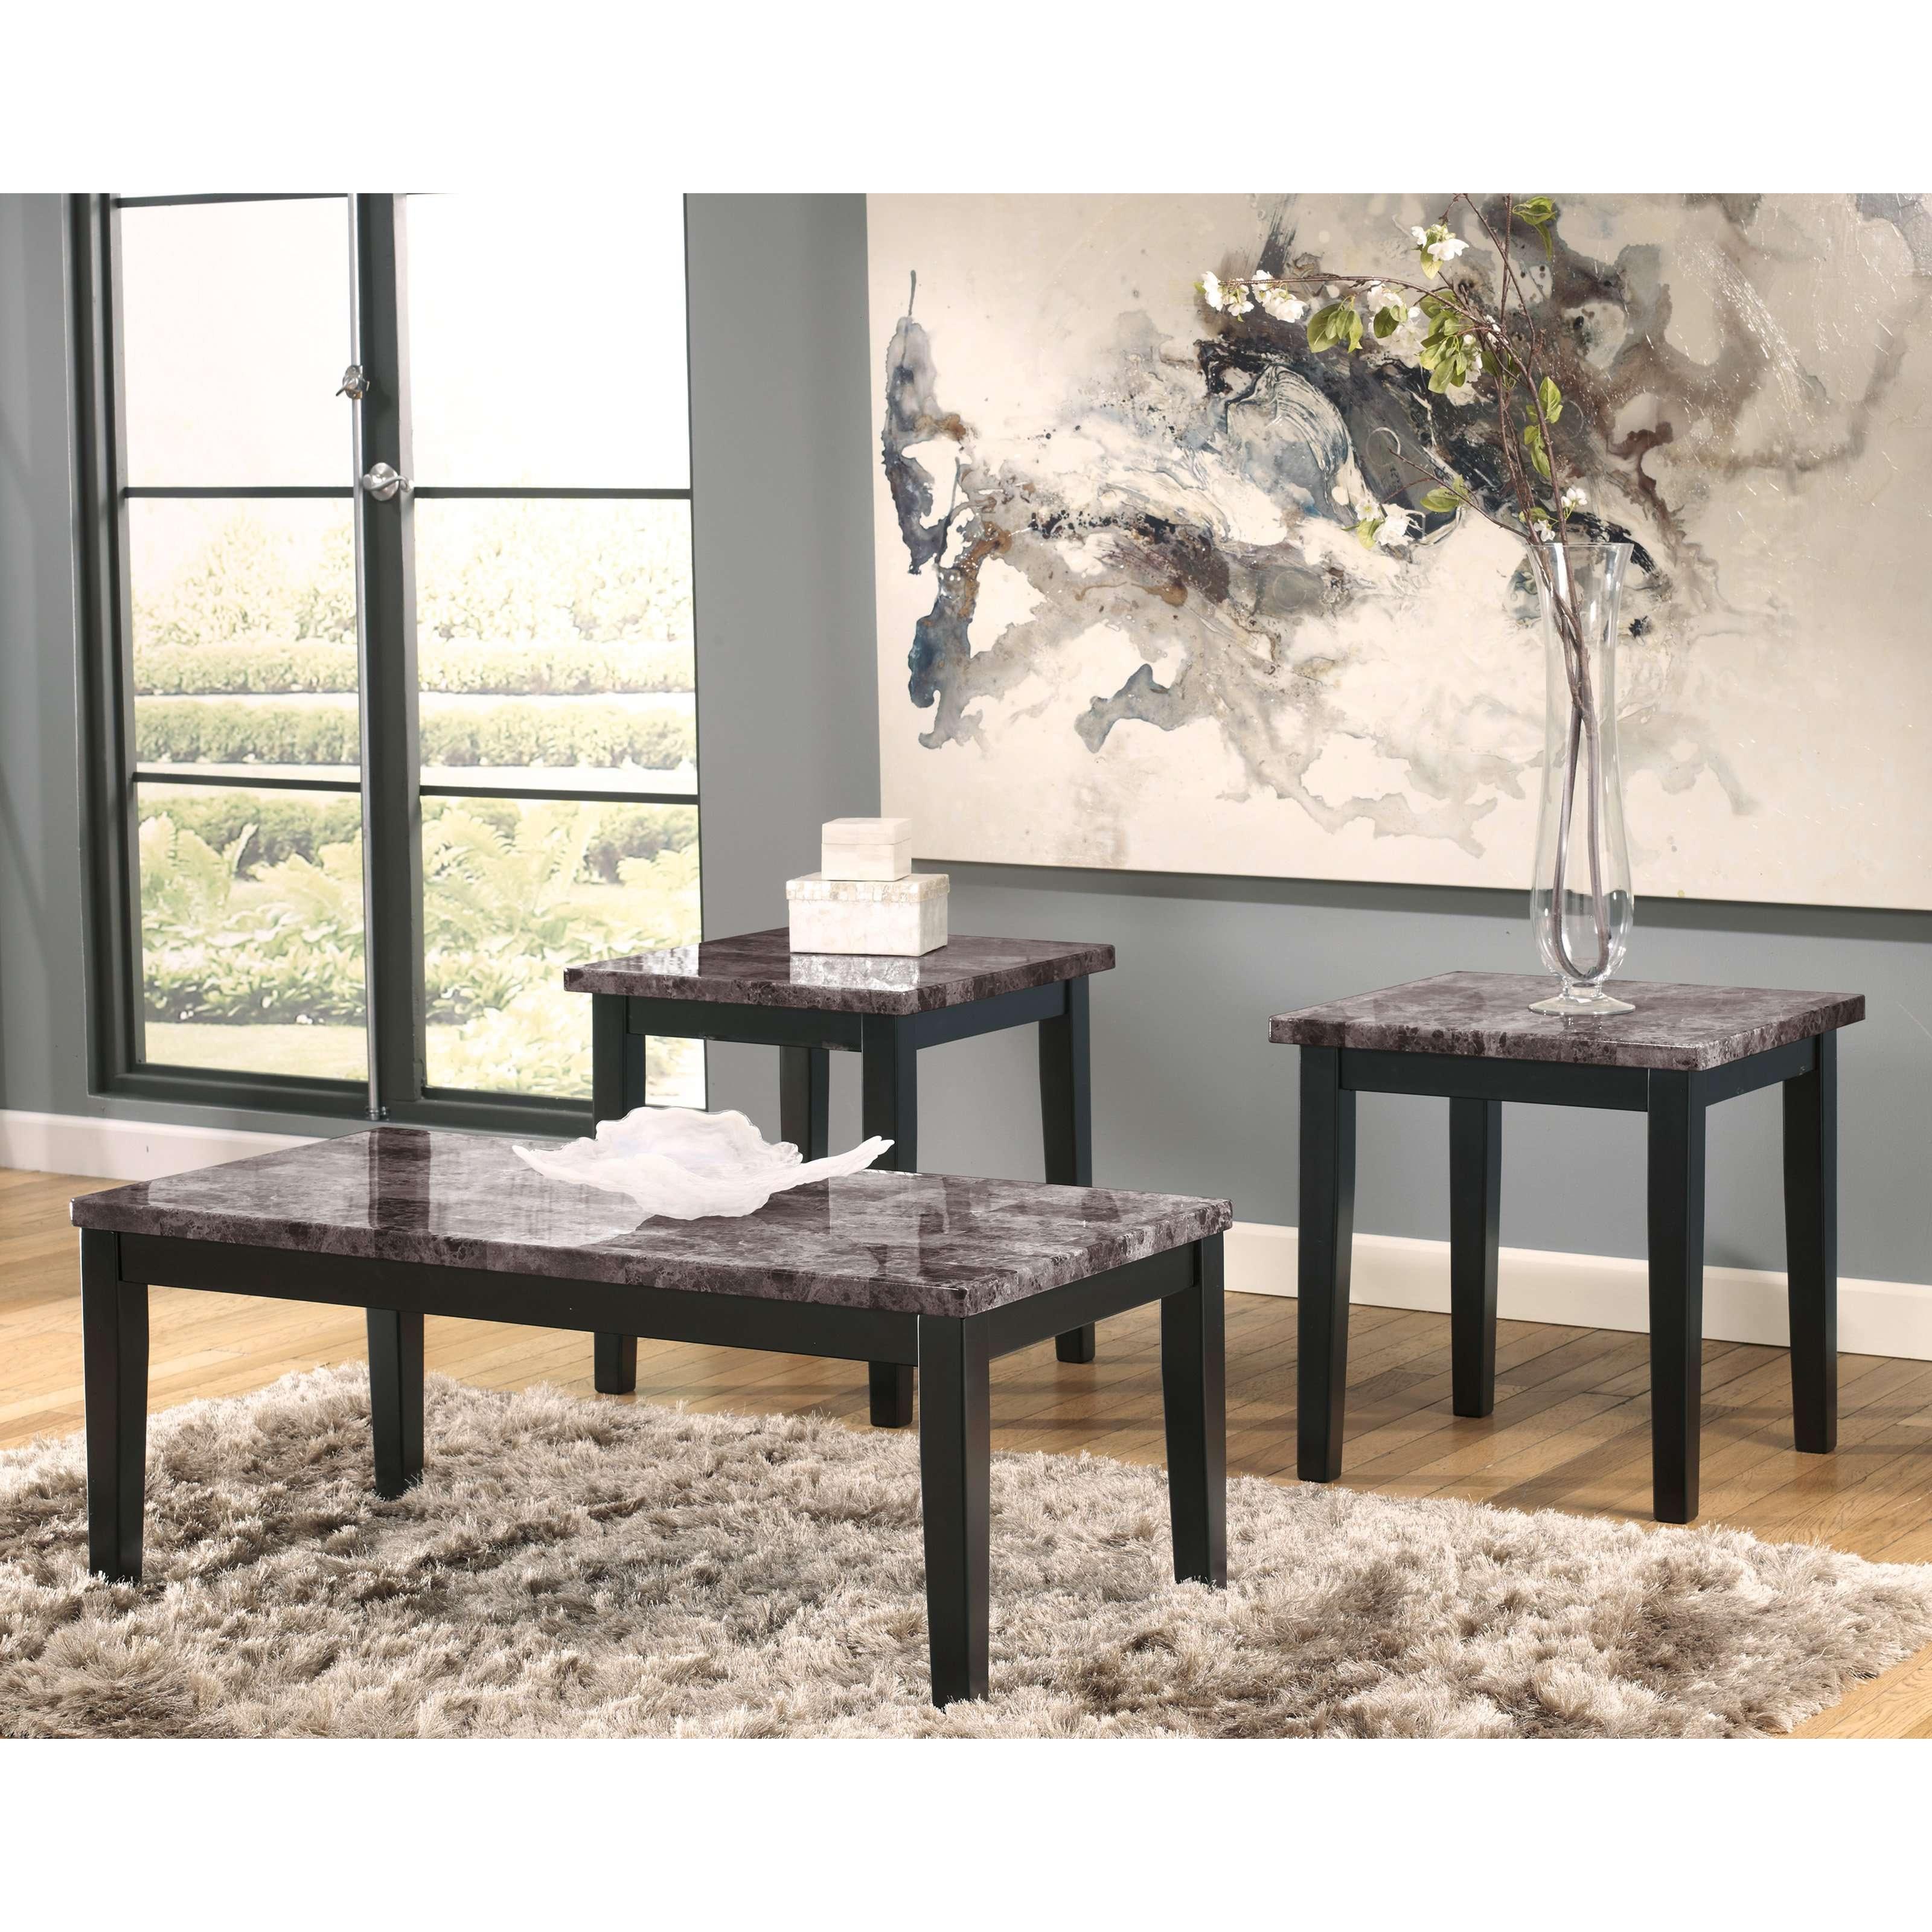 Coffee Table : Amazing Coffee Table Ashley Ashley Furniture Coffee Regarding 2018 Grey Coffee Table Sets (View 10 of 20)